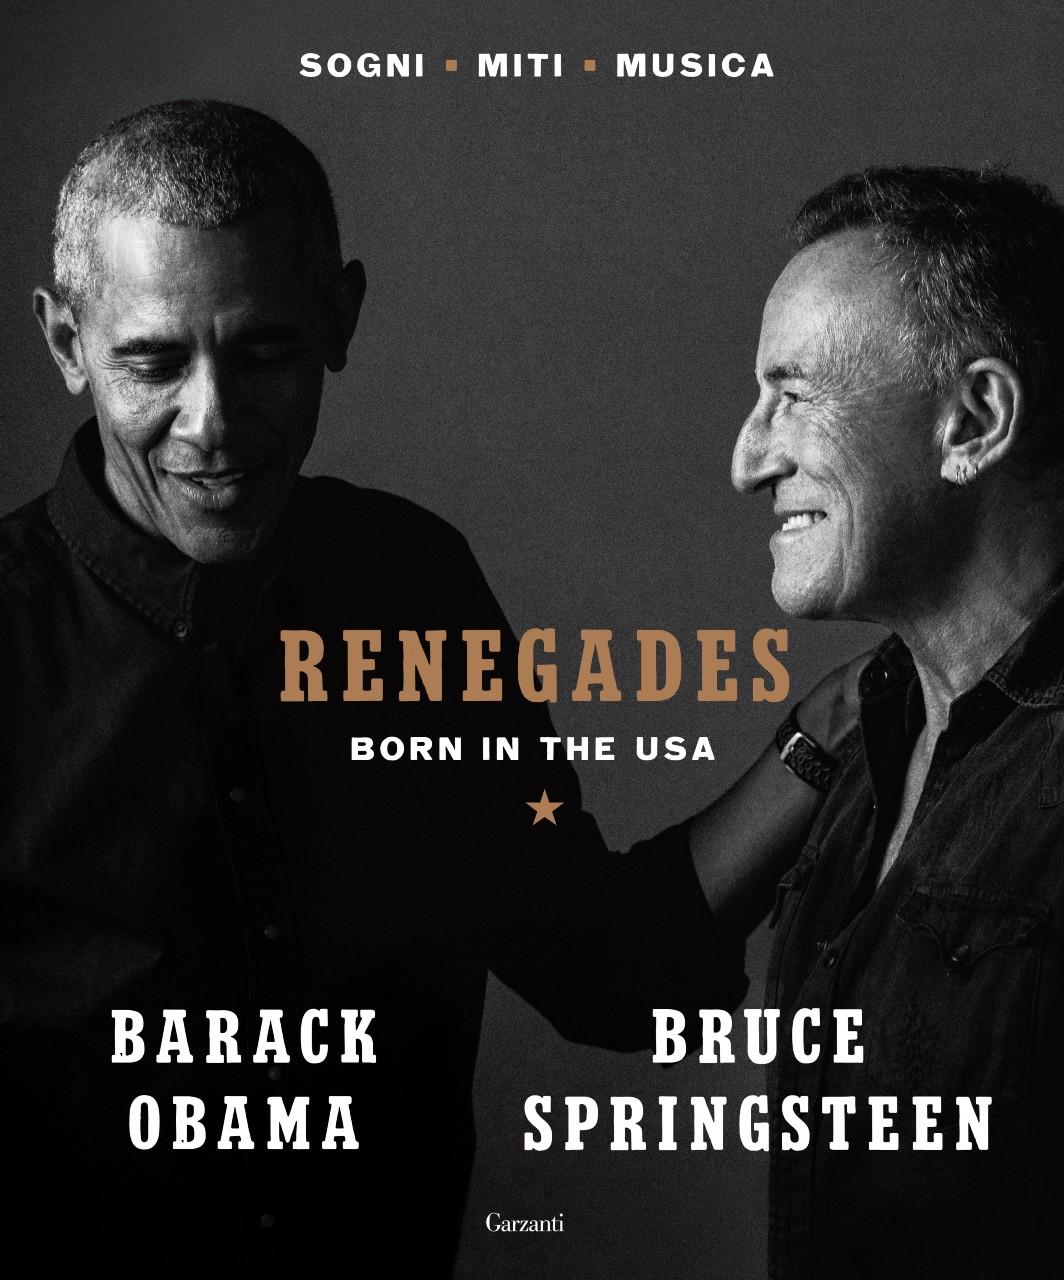 Garzanti - Barack Obama e Bruce Springsteen. RENEGADES. BORN IN THE USA